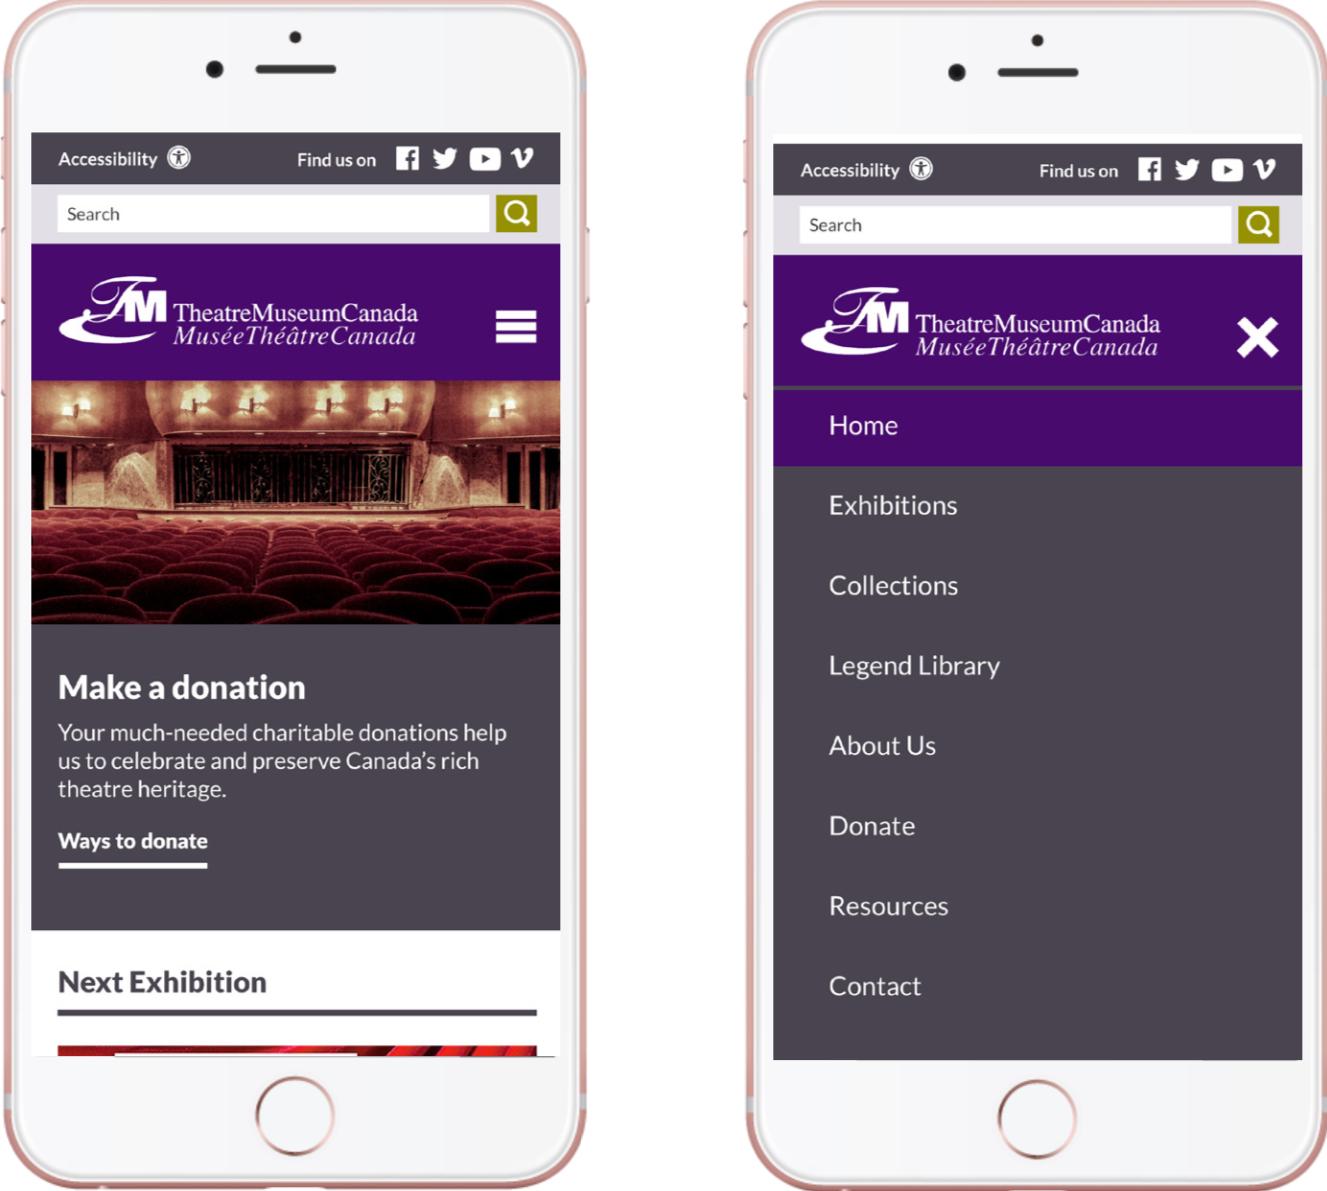 Mobile application mock-up of Theatre Museum Canada app - Donations & main menu navigation